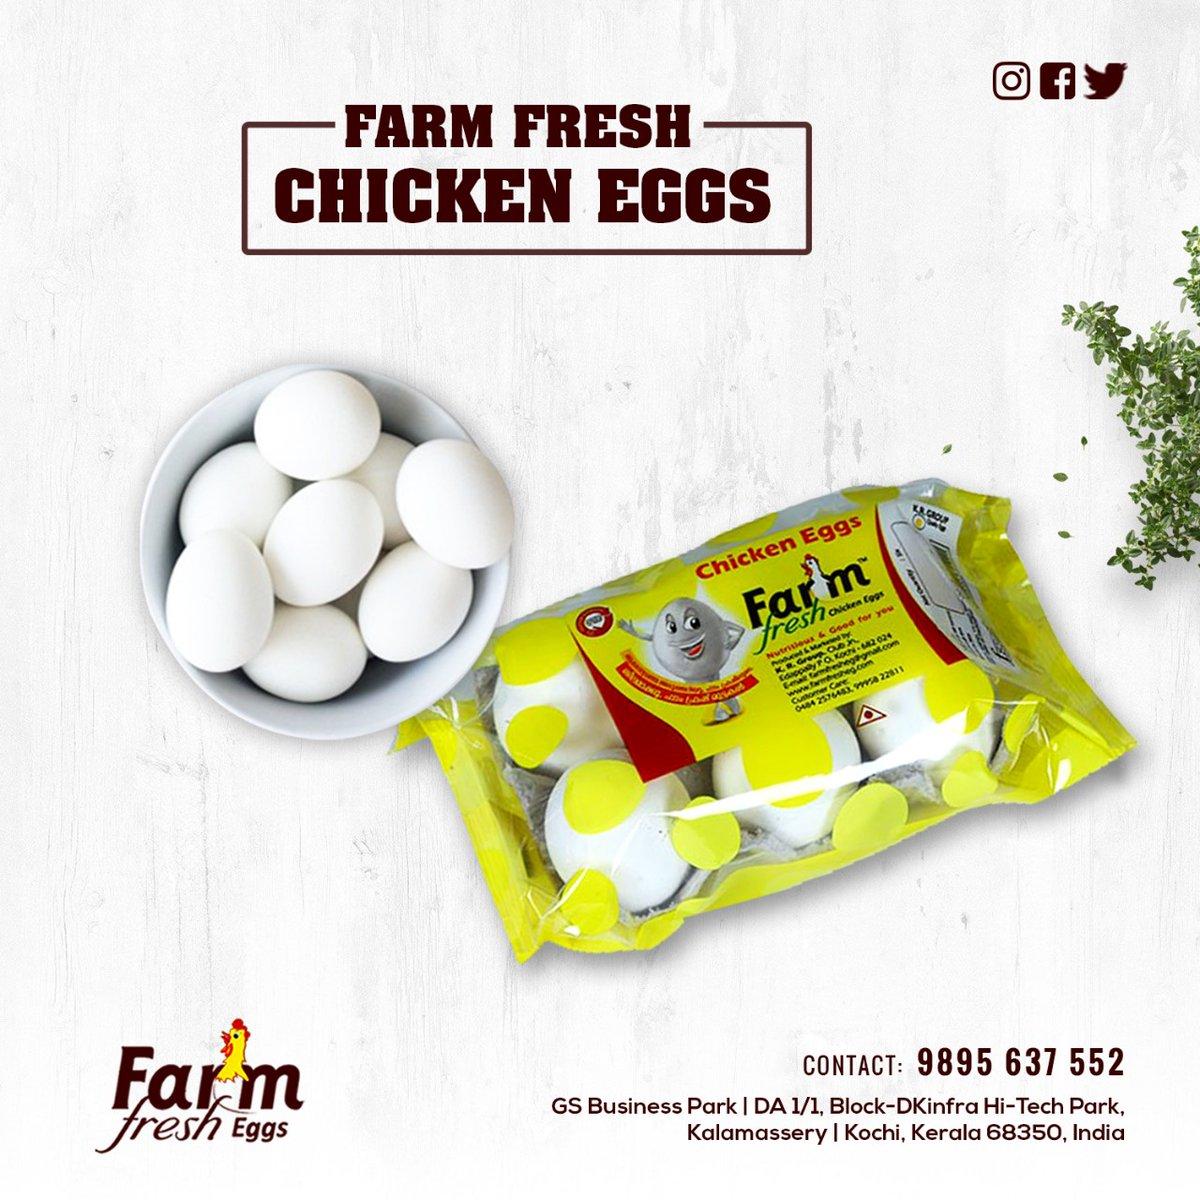 We care about Quality & Food Safety!! #farmfresh #farmfresheggs #farmfreshtoyou #fresheggs #fresheggsdaily #fresheggsdaily #fresheggseveryday #farmfresheggs #fresheggsarethebest #eggs #eggsofinstagram #eggwhites #eggs #duckeggs #duckegg #duckeggsdaily #reliance #reliancefresh https://t.co/9WcQnvKLnw